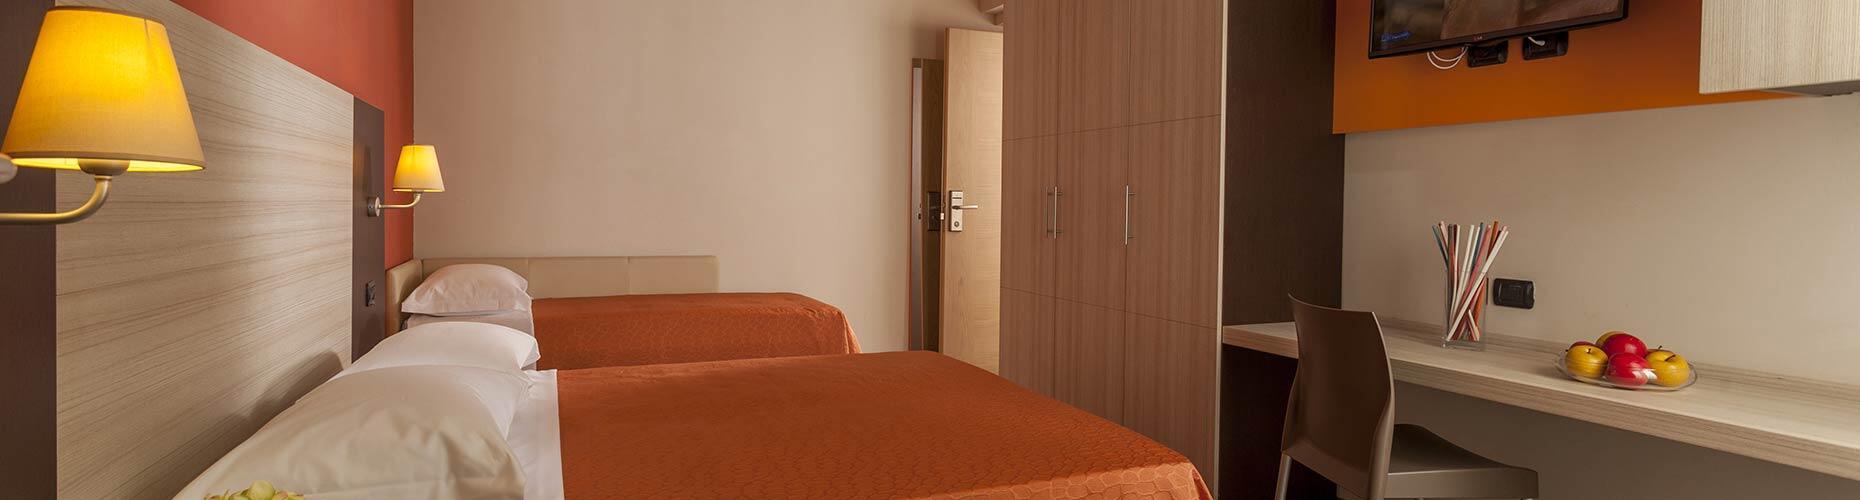 hotelauroramare en rooms 003